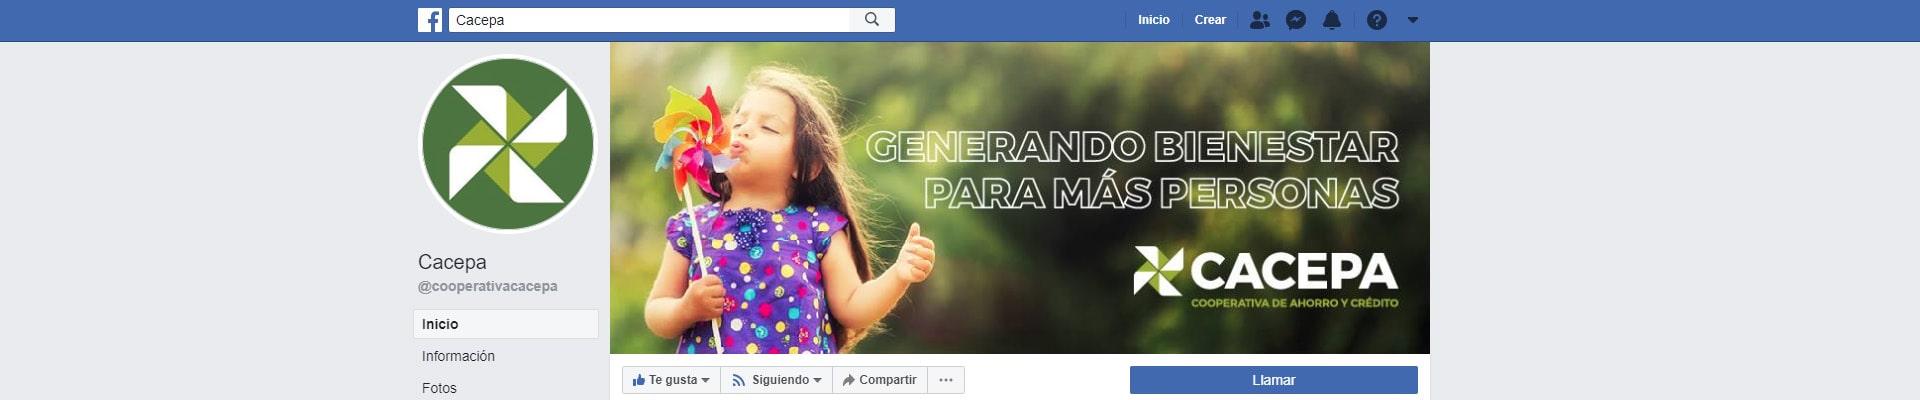 graficas facebook cacepa